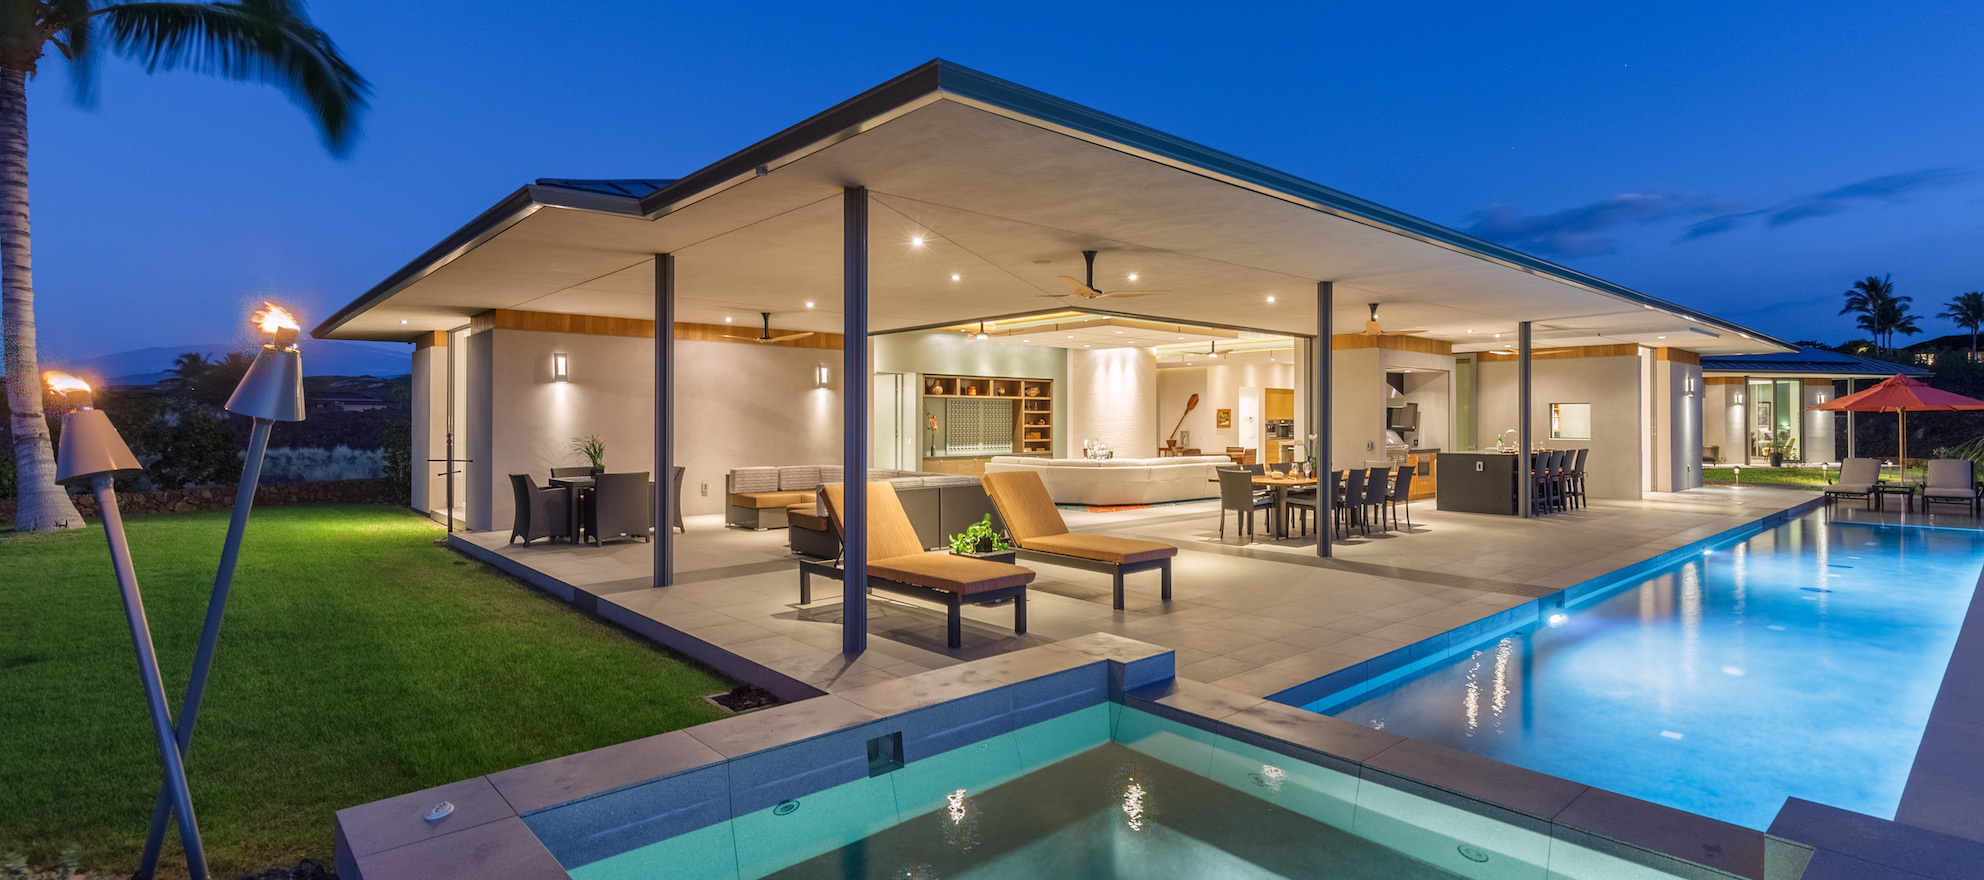 Luxury listing: 4-building compound on Hawaii's Big Island